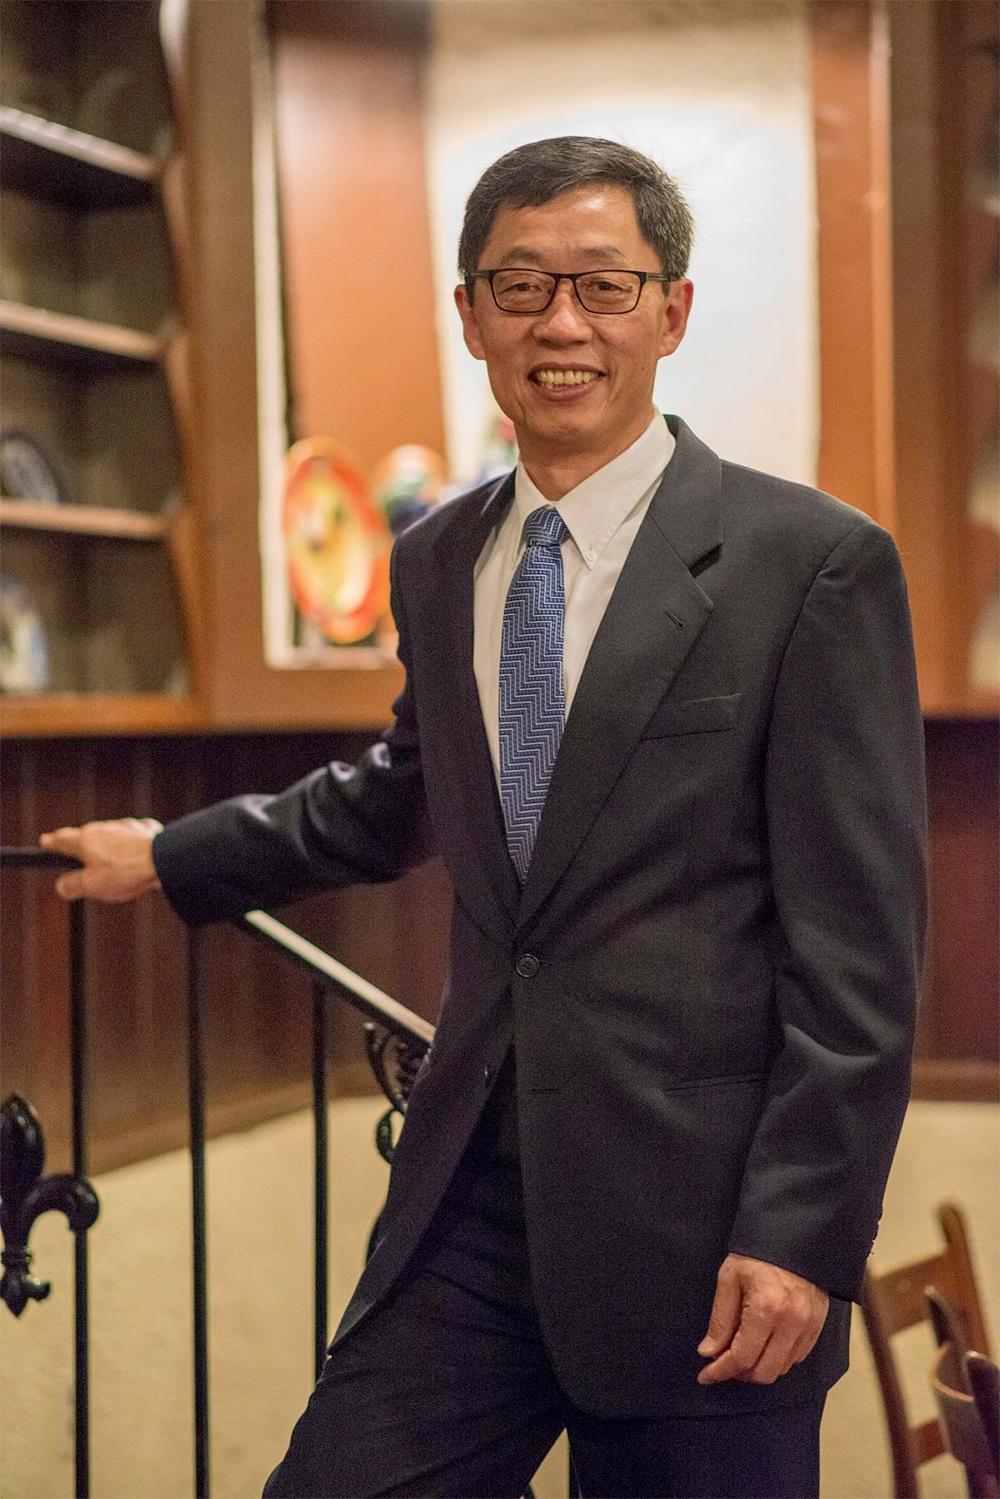 Genetron Health Appoints Former FDA Senior Officer Dr. Yun-Fu Hu as Chief Medical Officer